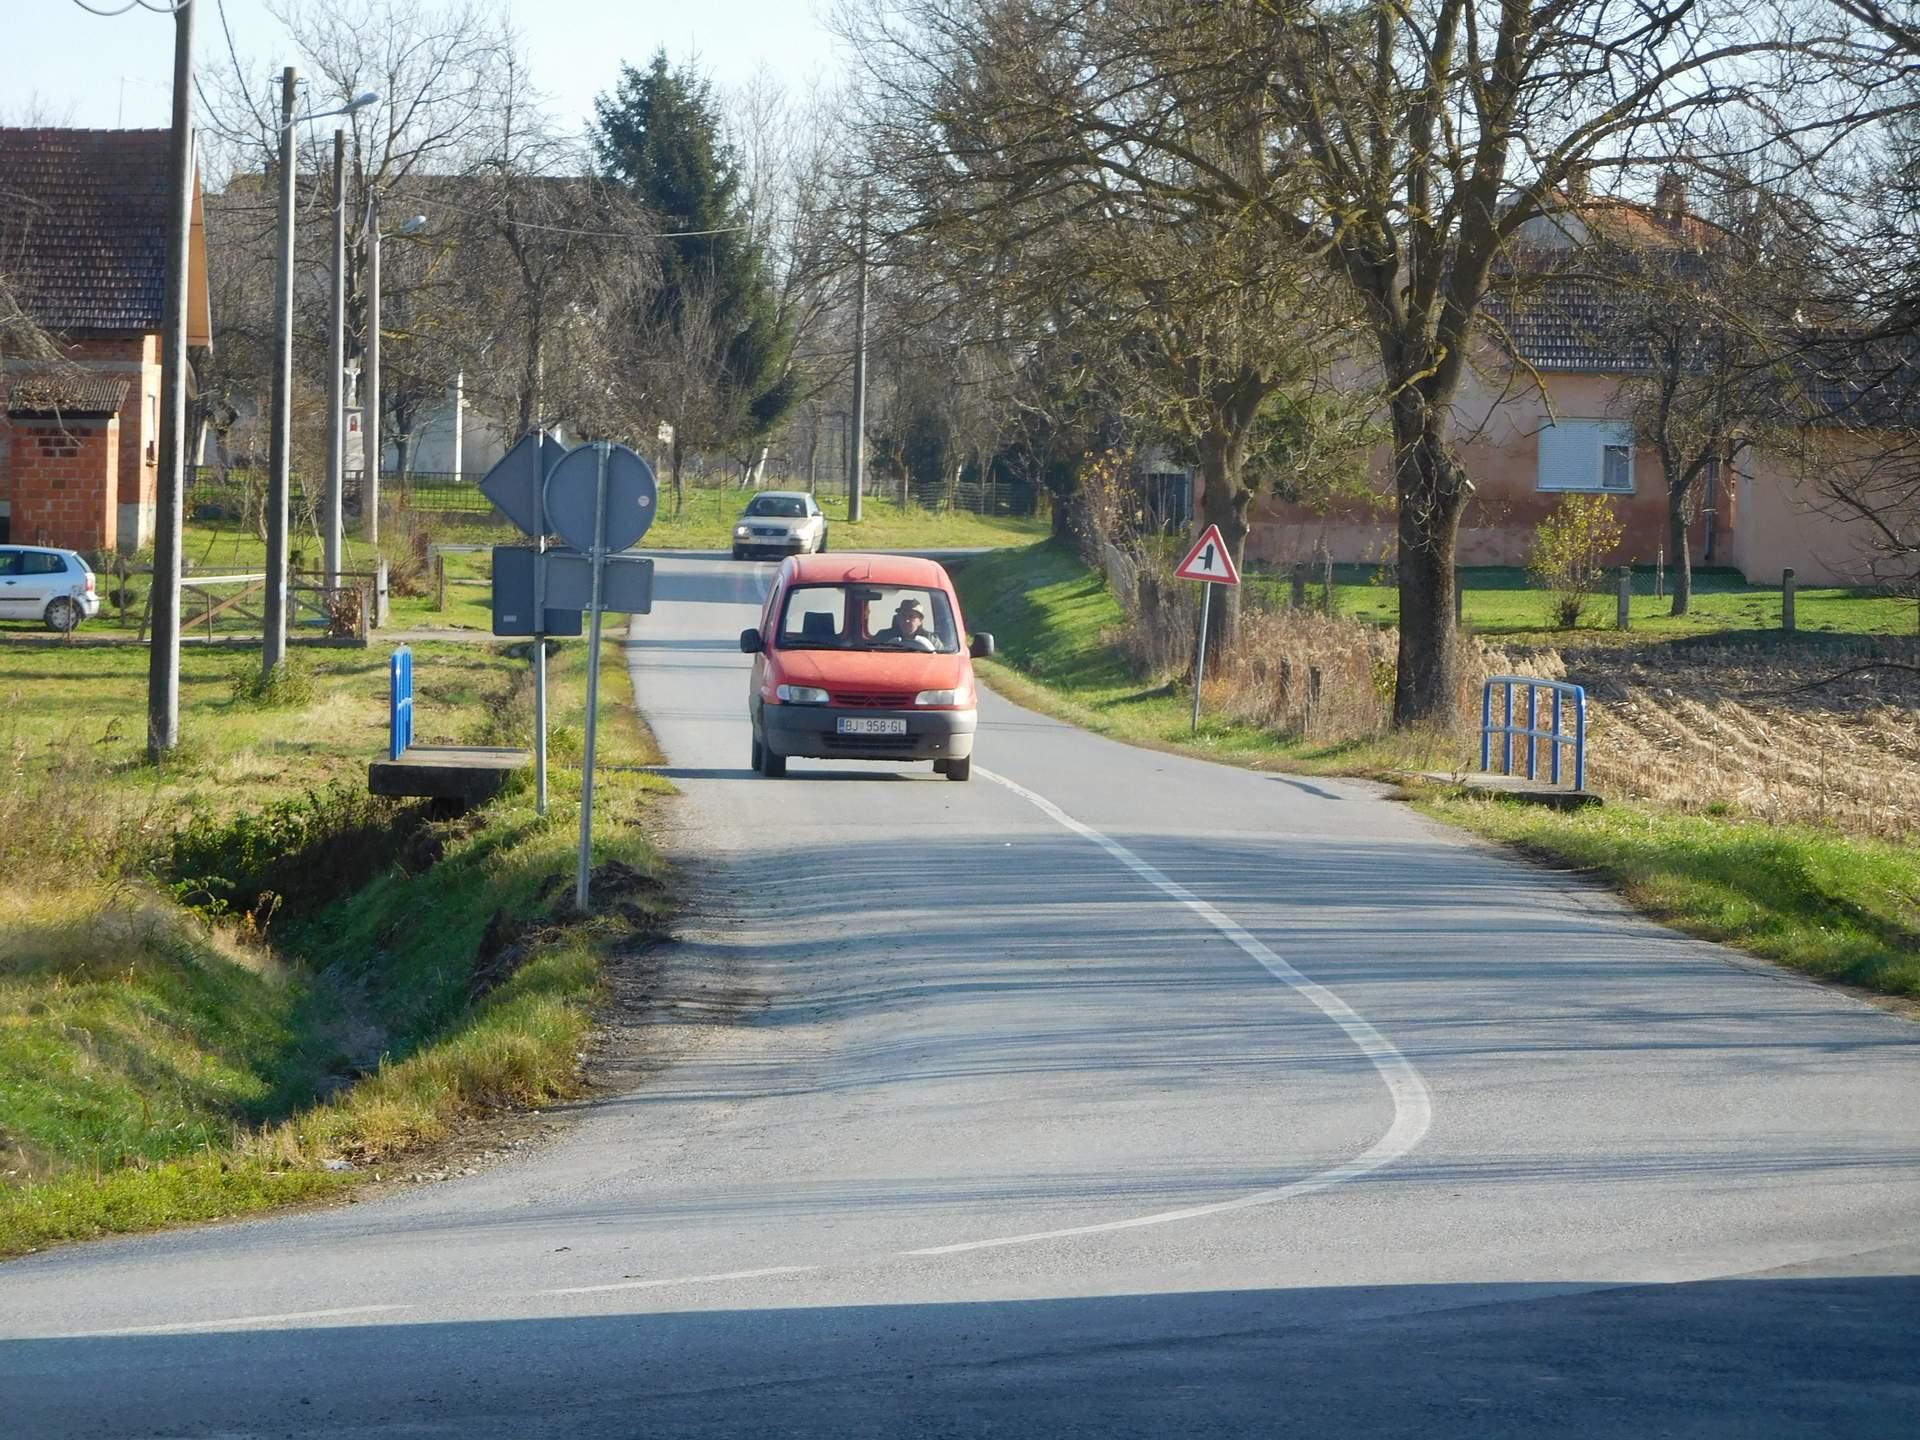 Gradonačelnik posjetio Galovac povodom završetka obnove ceste duge 1450 metara, 28. studenoga 2017. FOTO: Grad Bjelovar www.bjelovar.hr